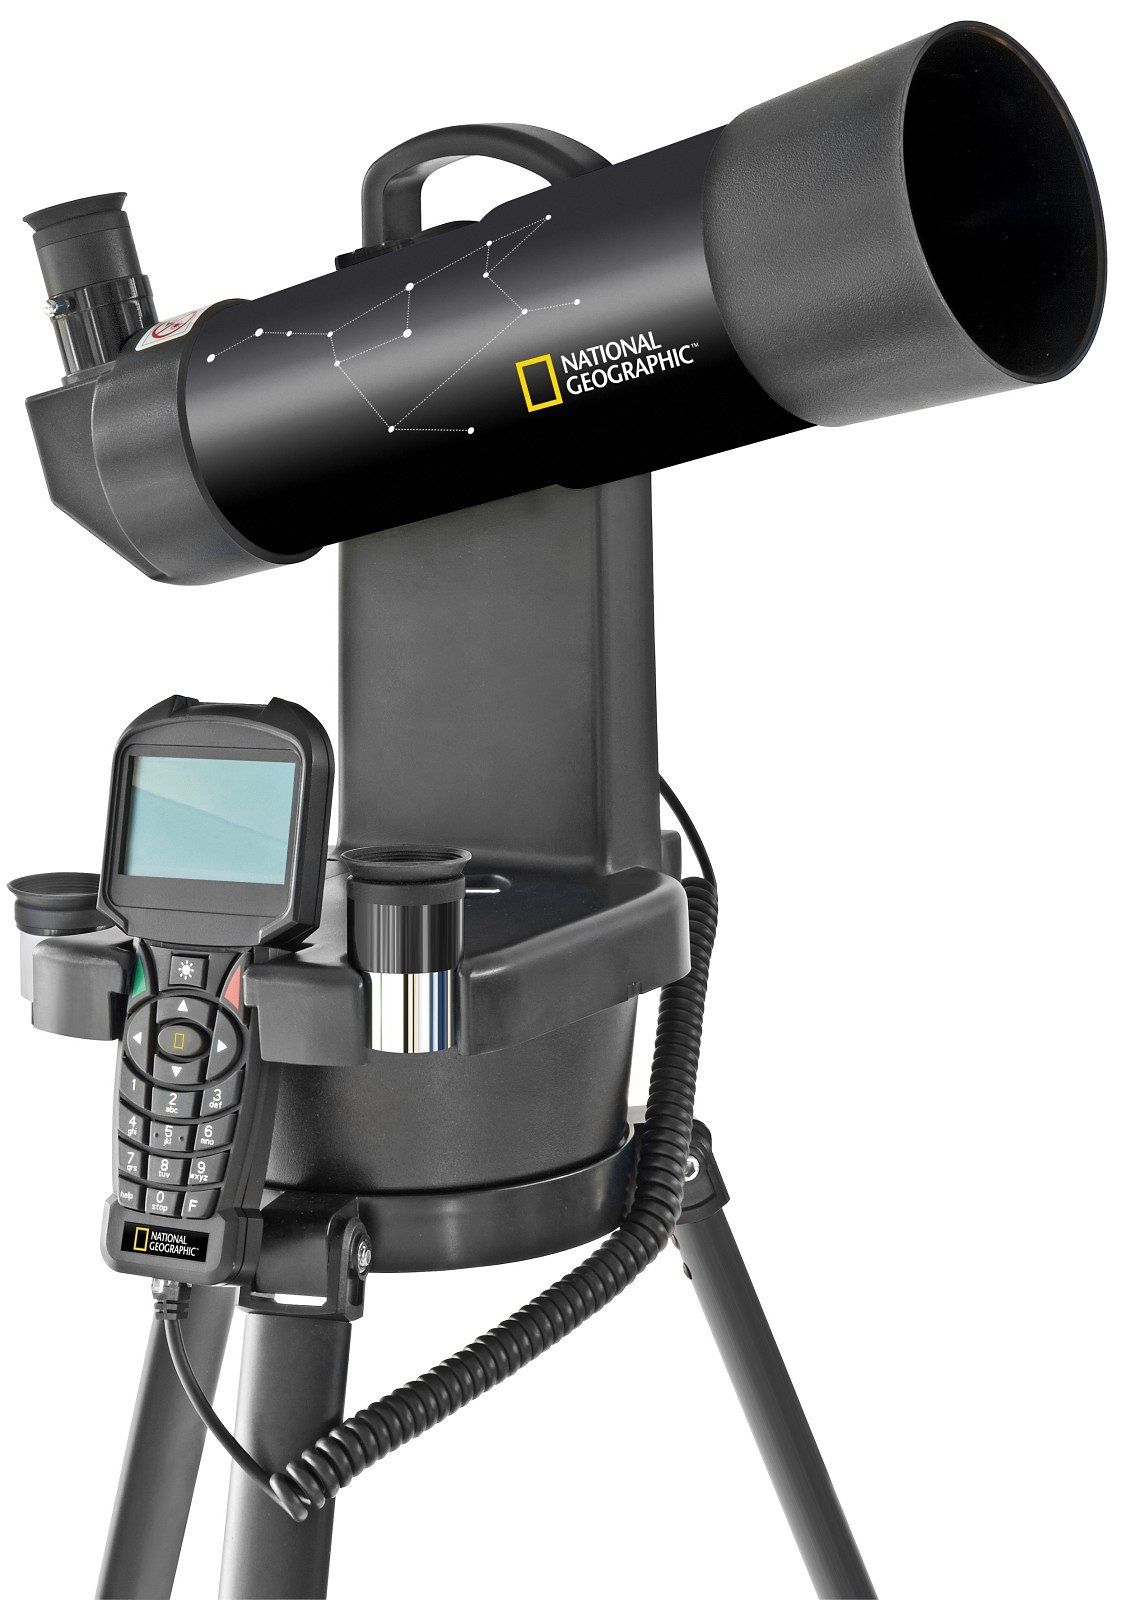 BRESSER Teleskop »NATIONAL GEOGRAPHIC Automatik 70/350 Teleskop«